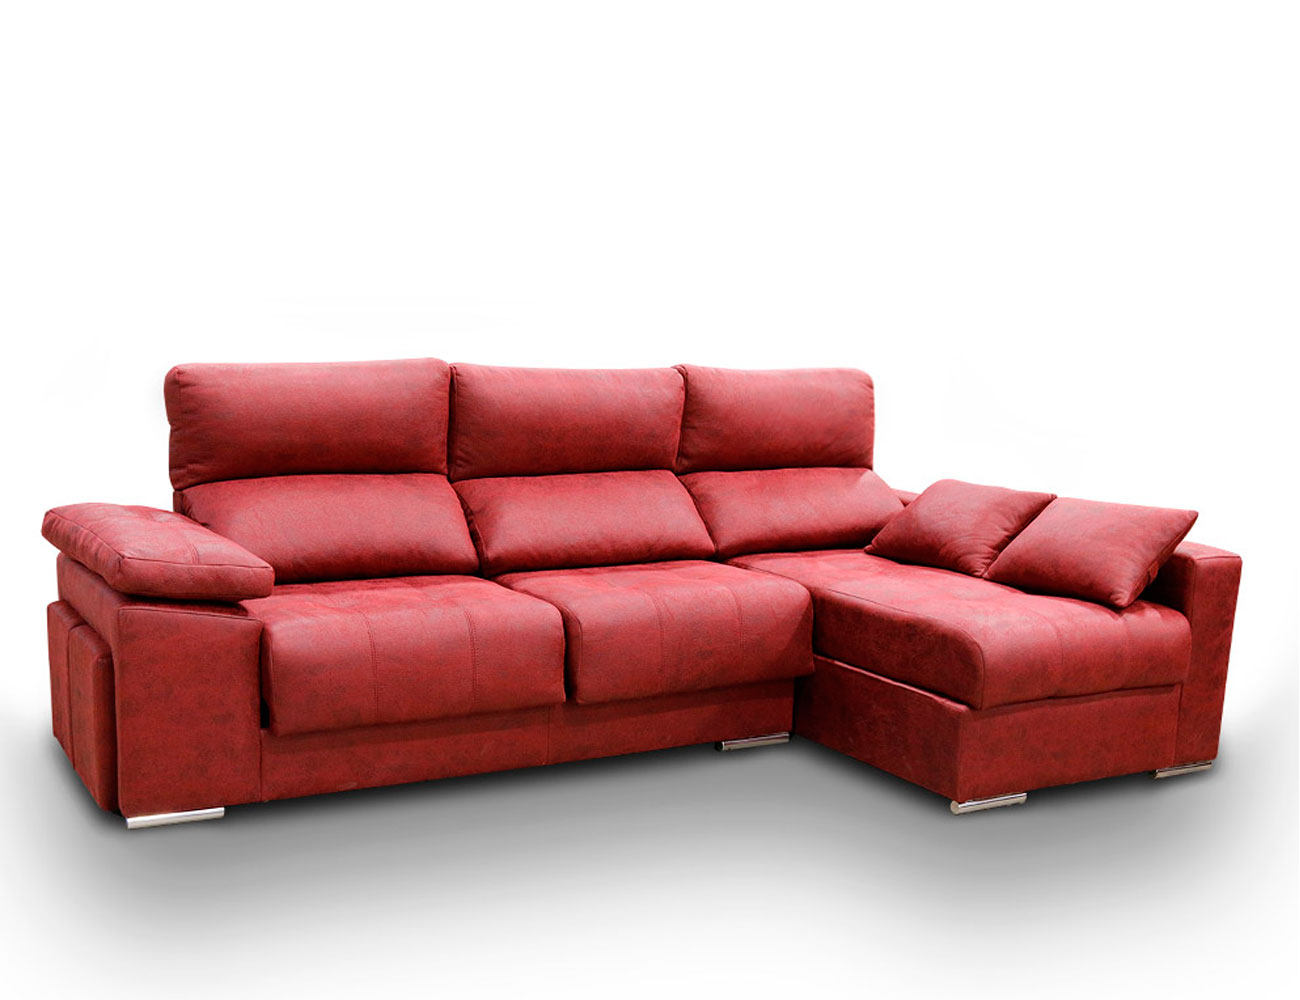 Sofa chaiselongue anti manchas rojo granate8